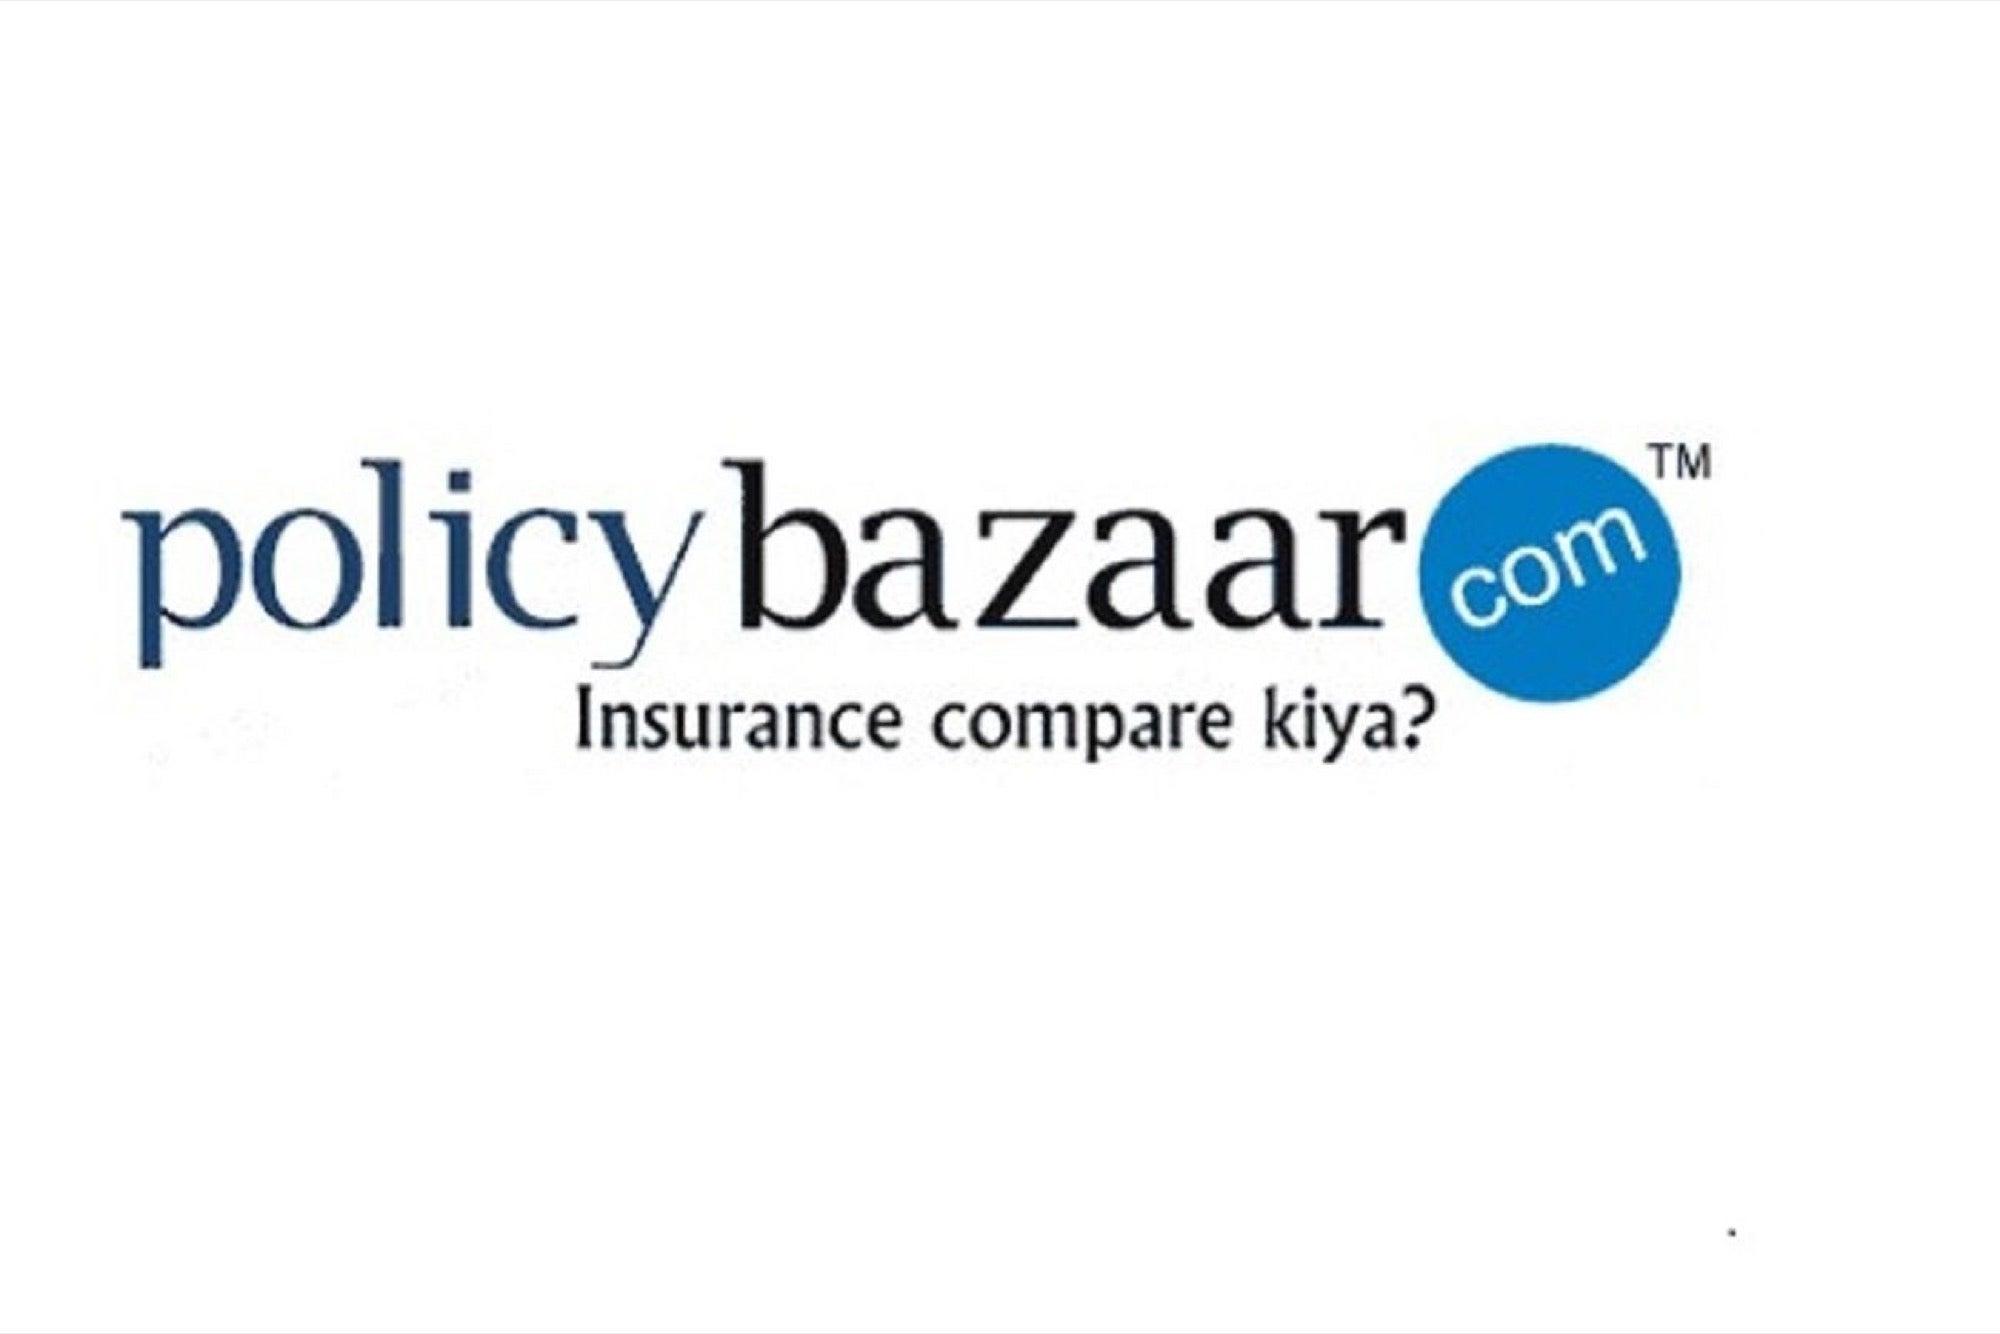 Policybazaar gets insurance broking licence | பாலிசிபஜார் காப்பீட்டு தரகு உரிமத்தைப் பெற்றுள்ளது |_40.1